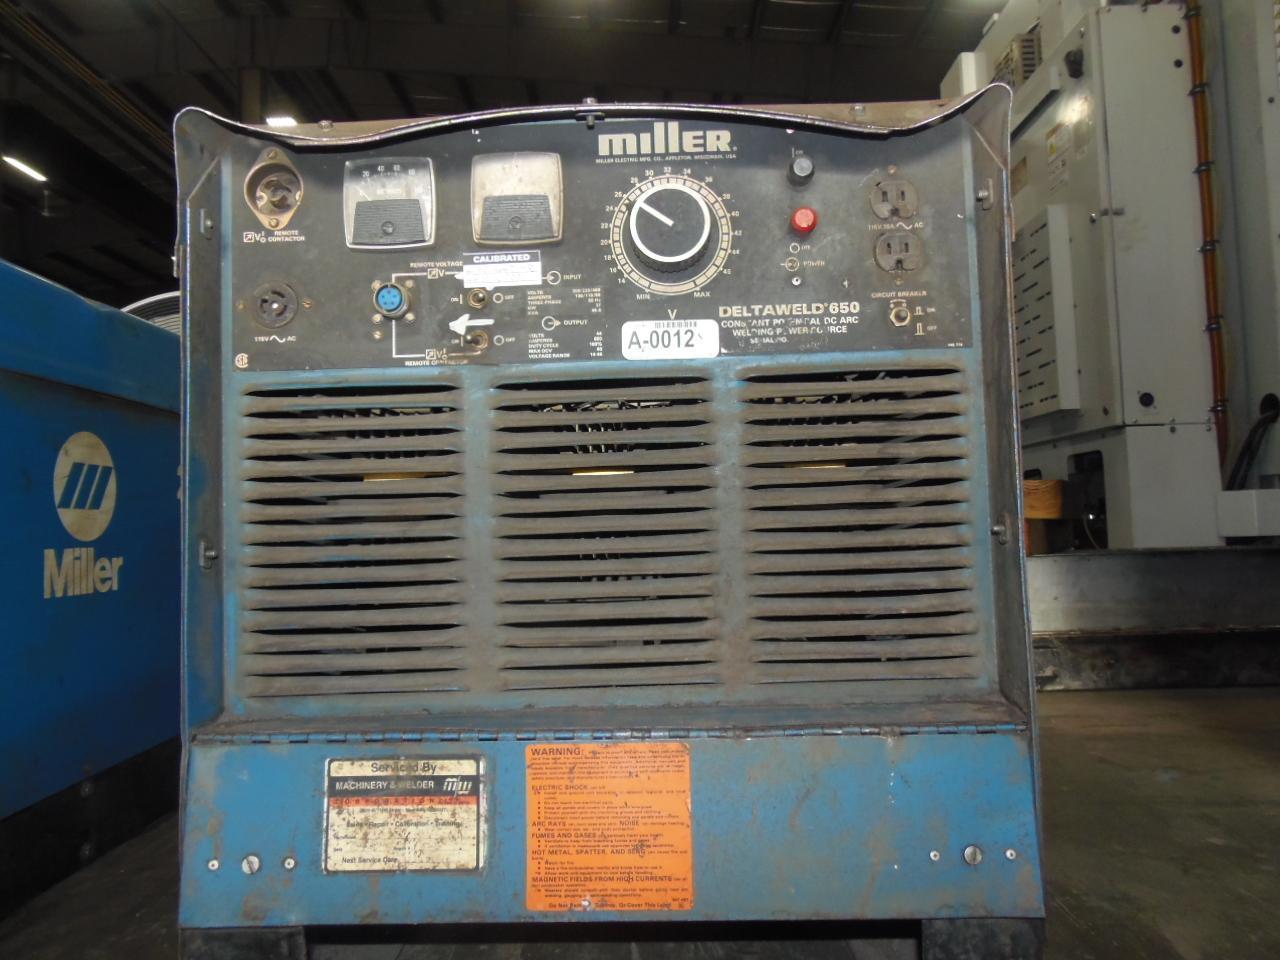 Miller 650 Amp Wire Feed Welder, Model Deltaweld 650, Power unit only